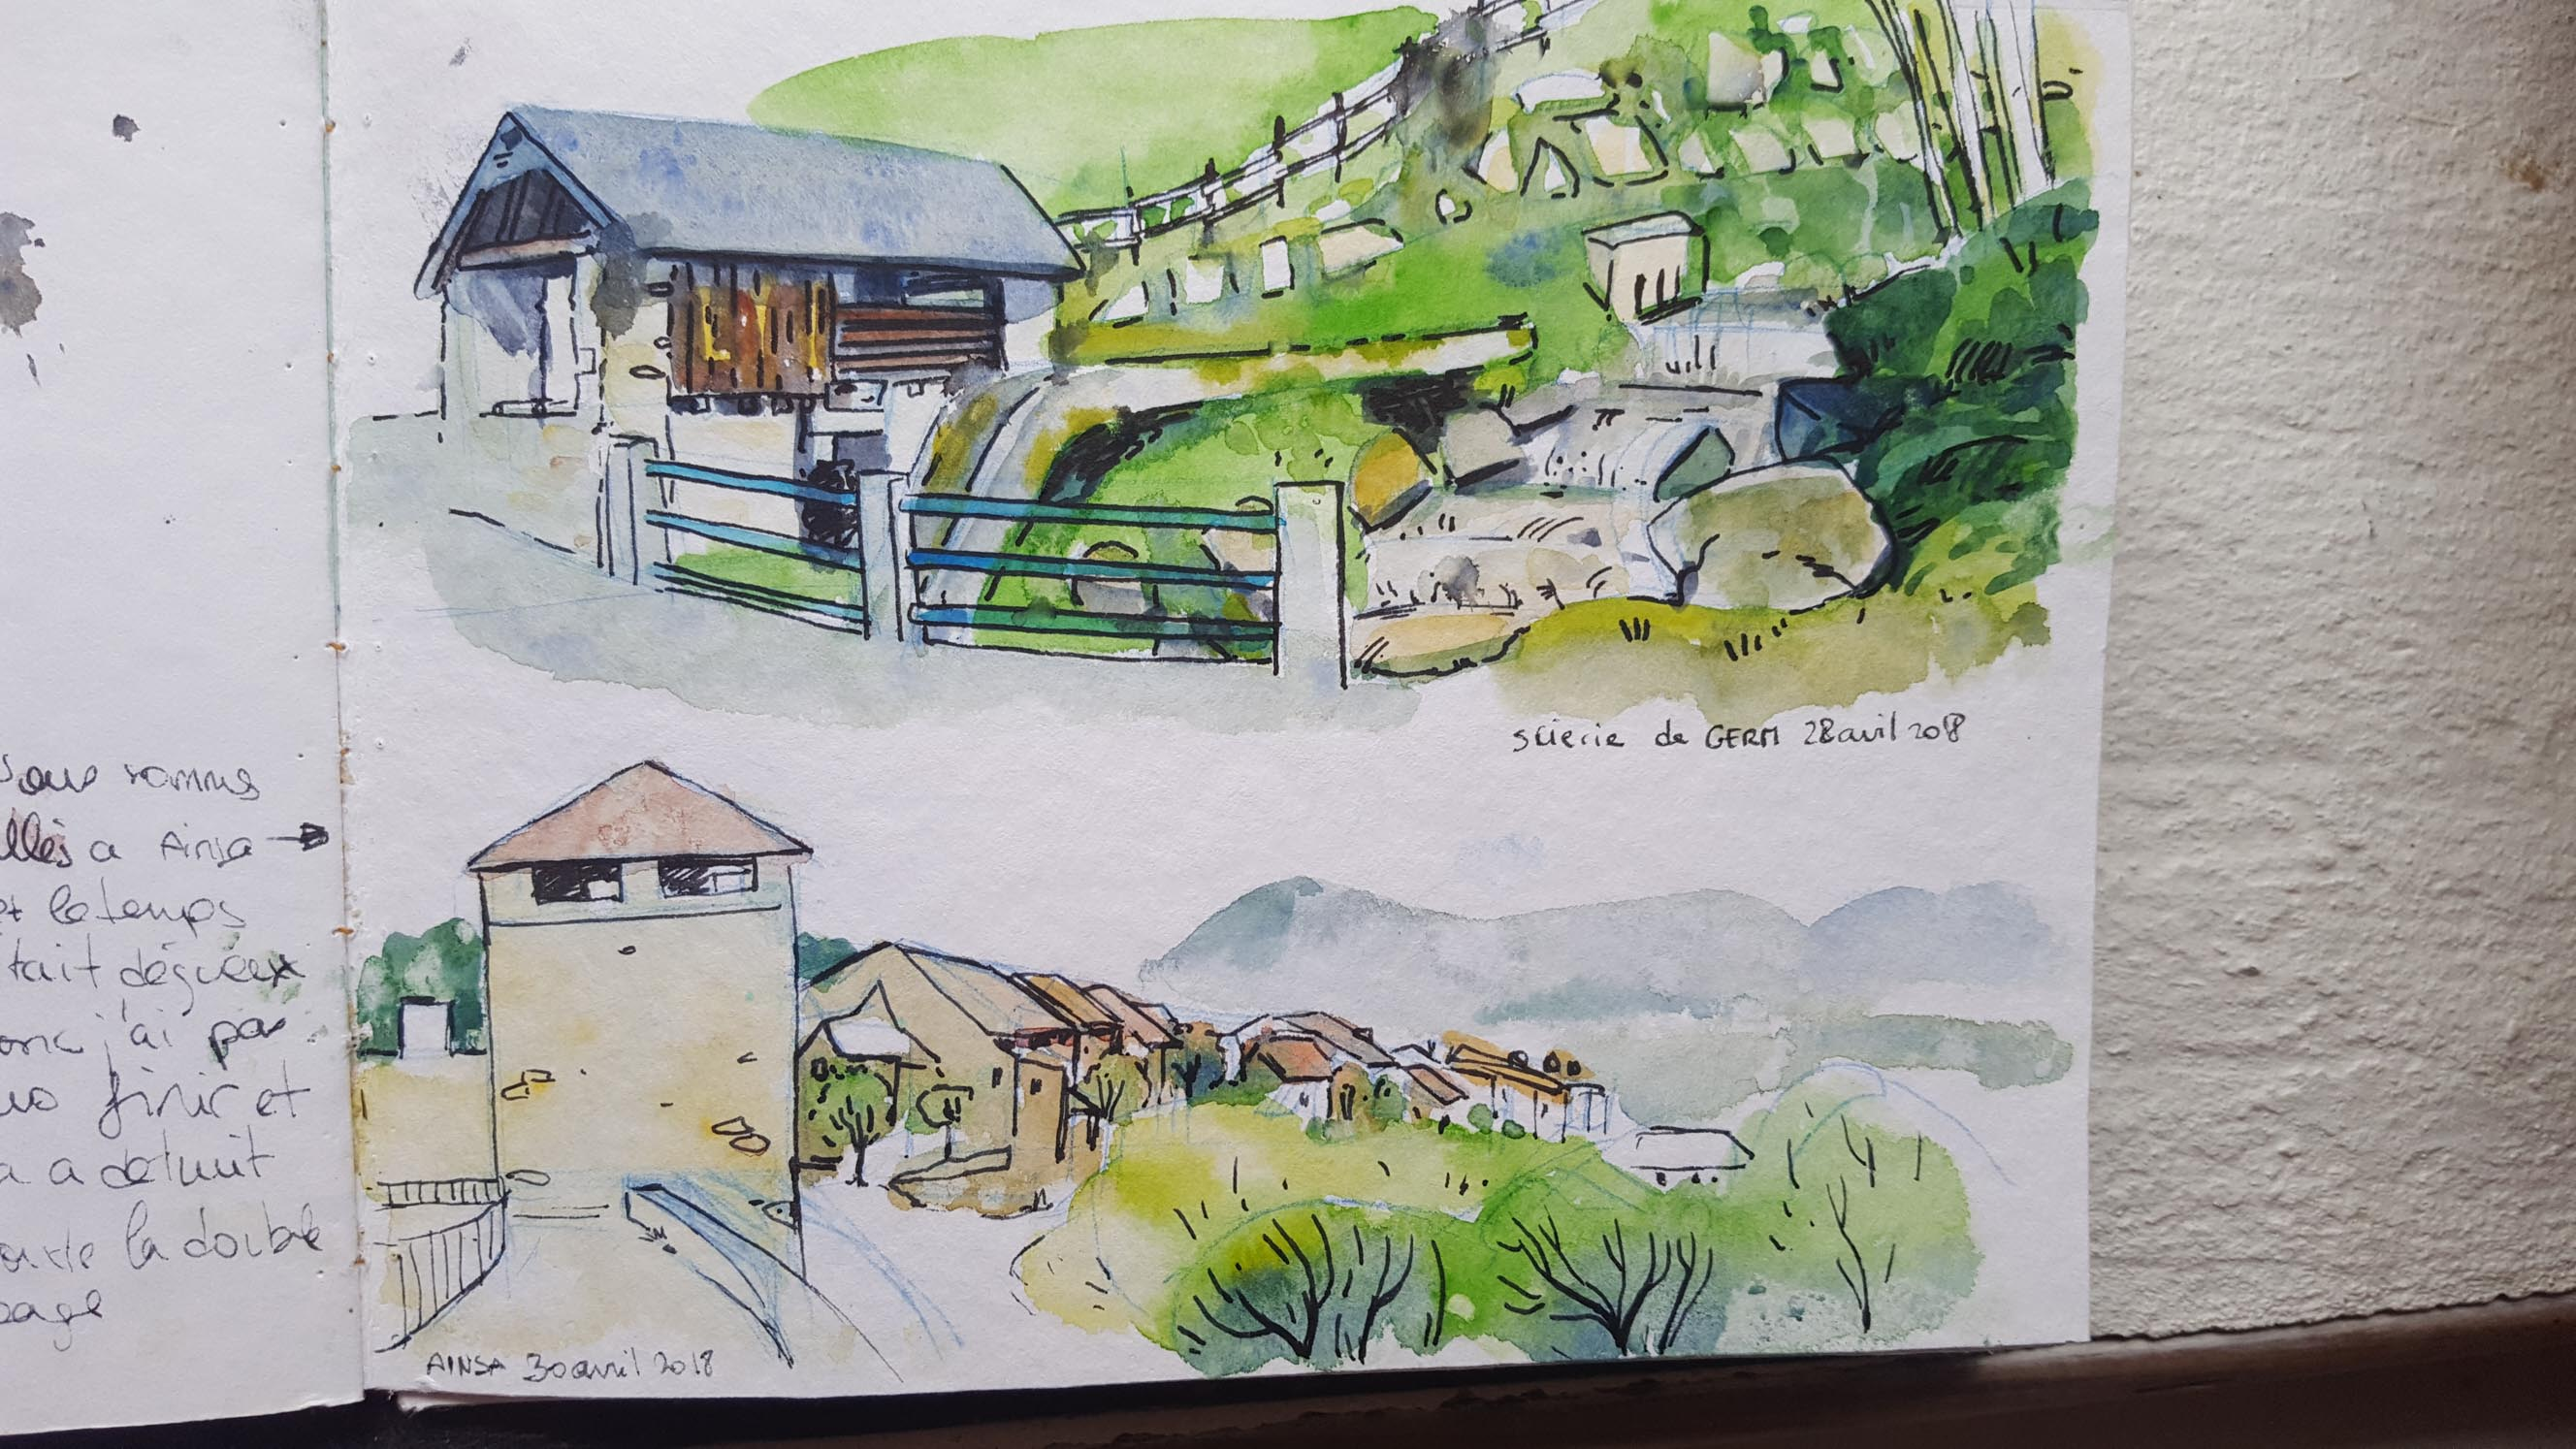 Sketchbook : IsaArne [ Challenge de l'ete P7 ] - Page 5 Facecr36